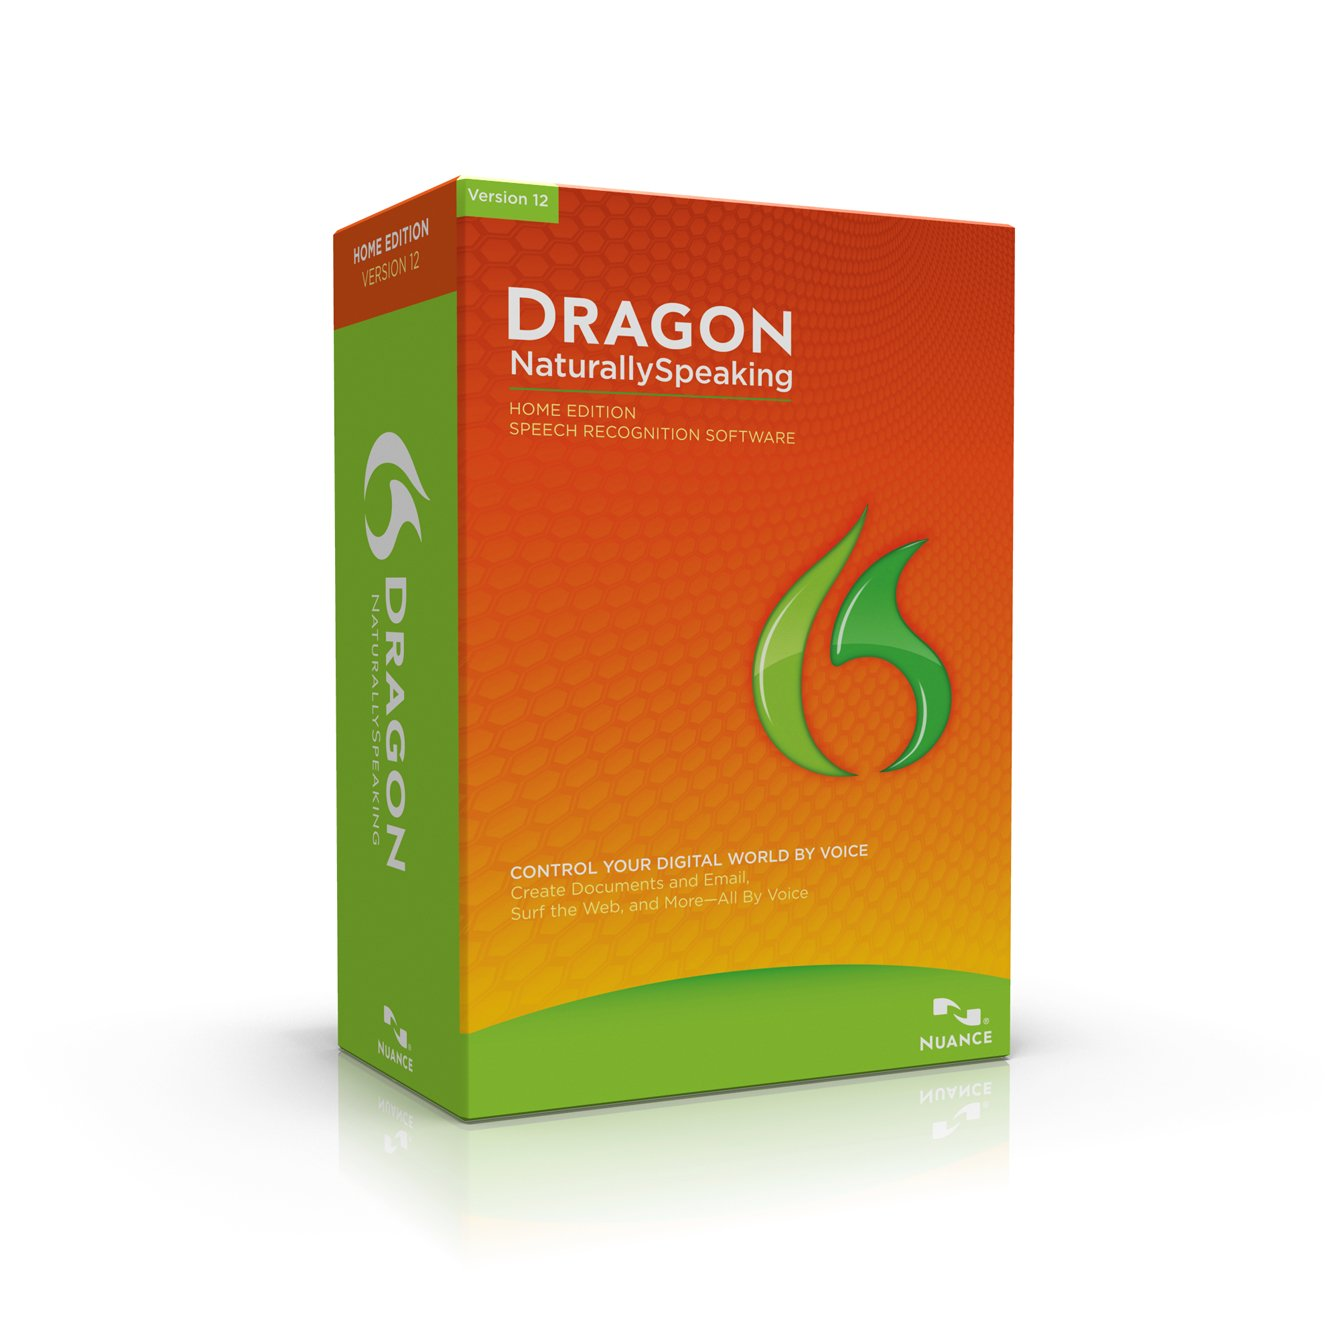 DRAGON NATURALLYSPEAKING 12 CRACK